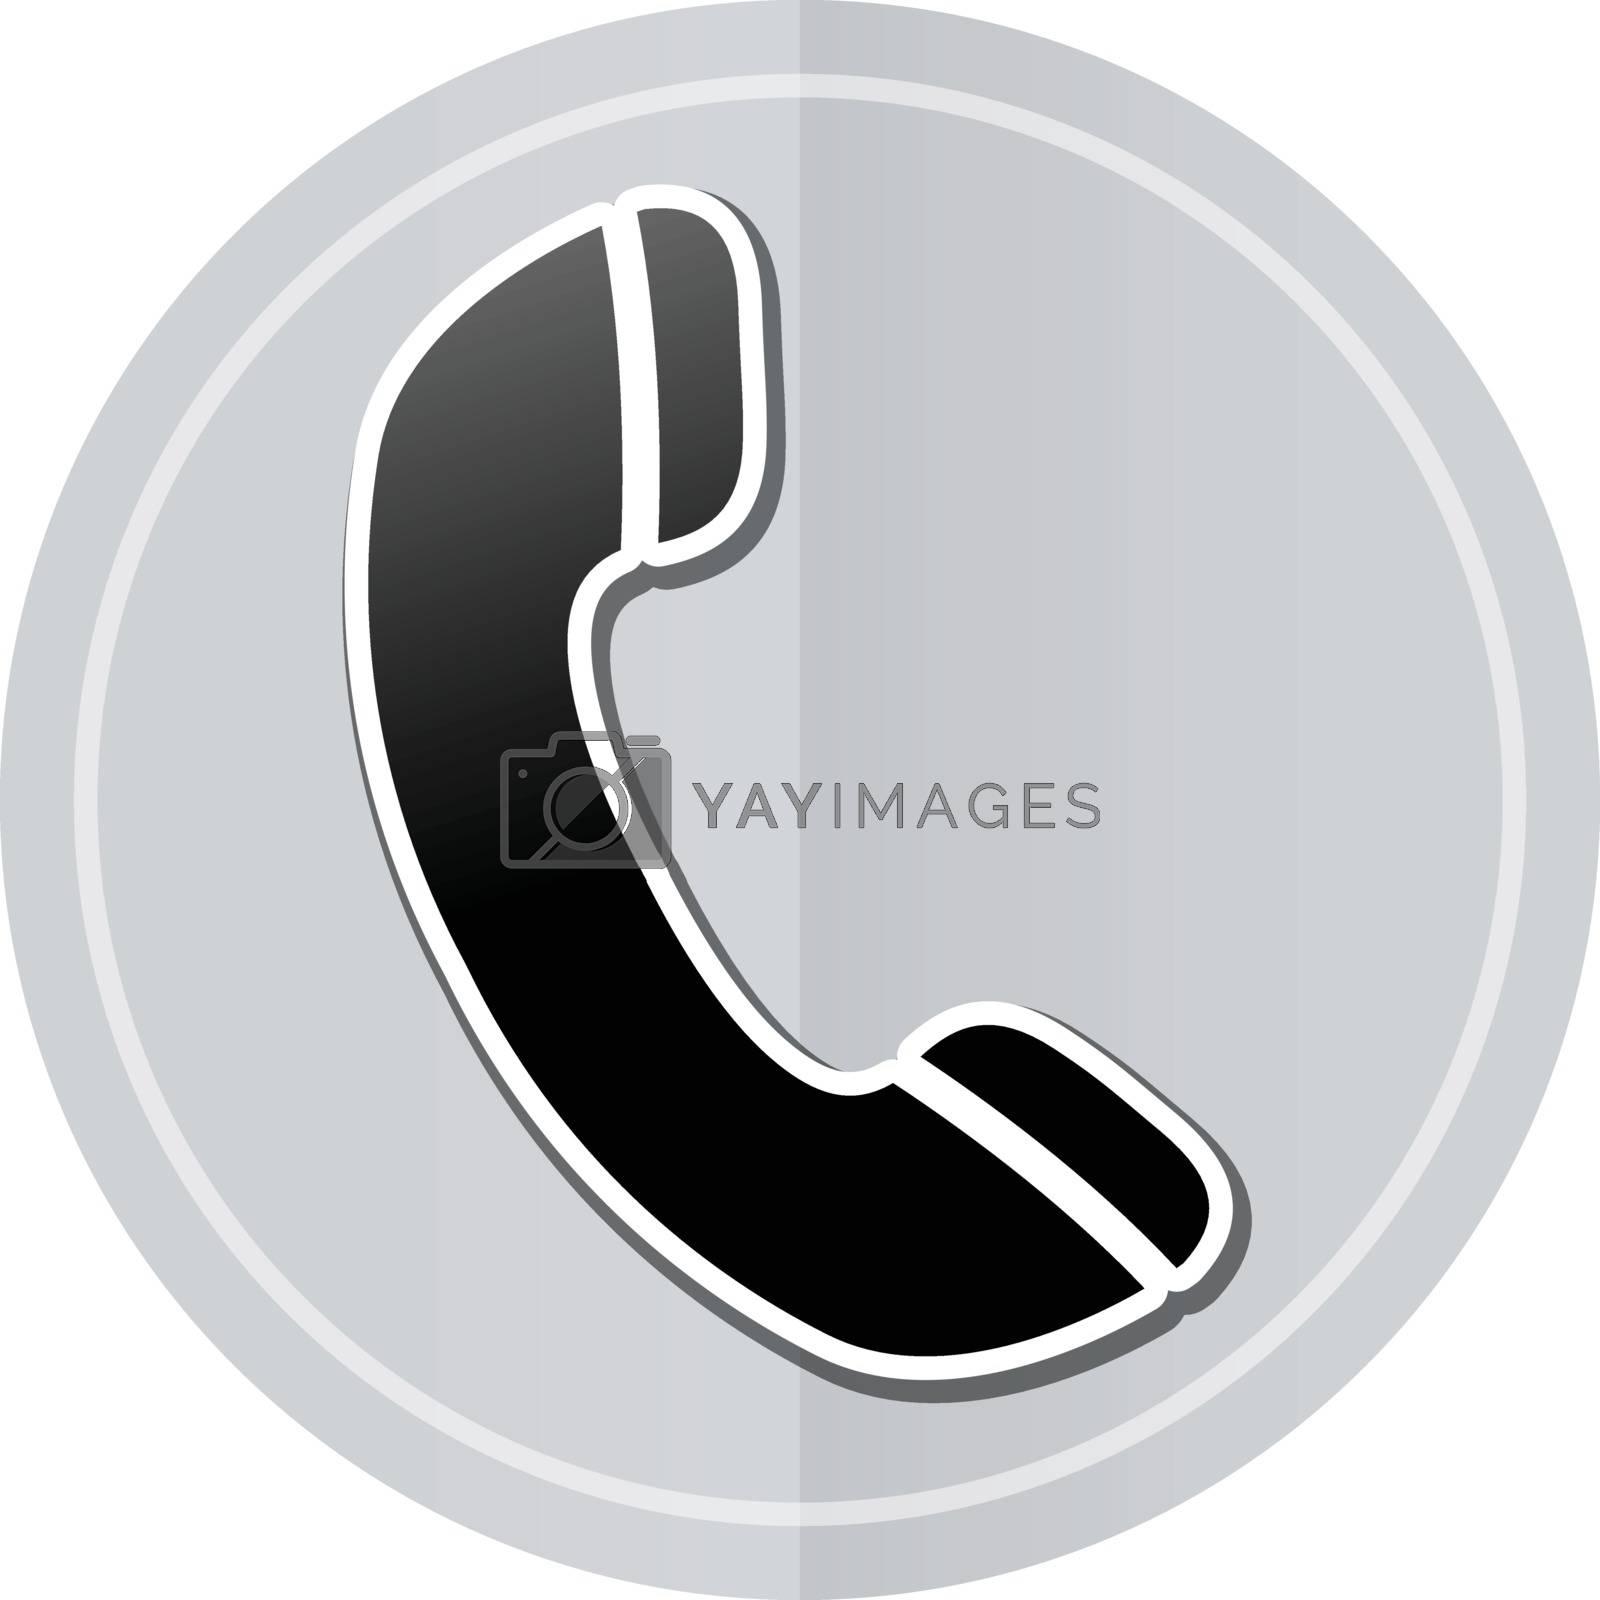 Illustration of phone sticker icon simple design